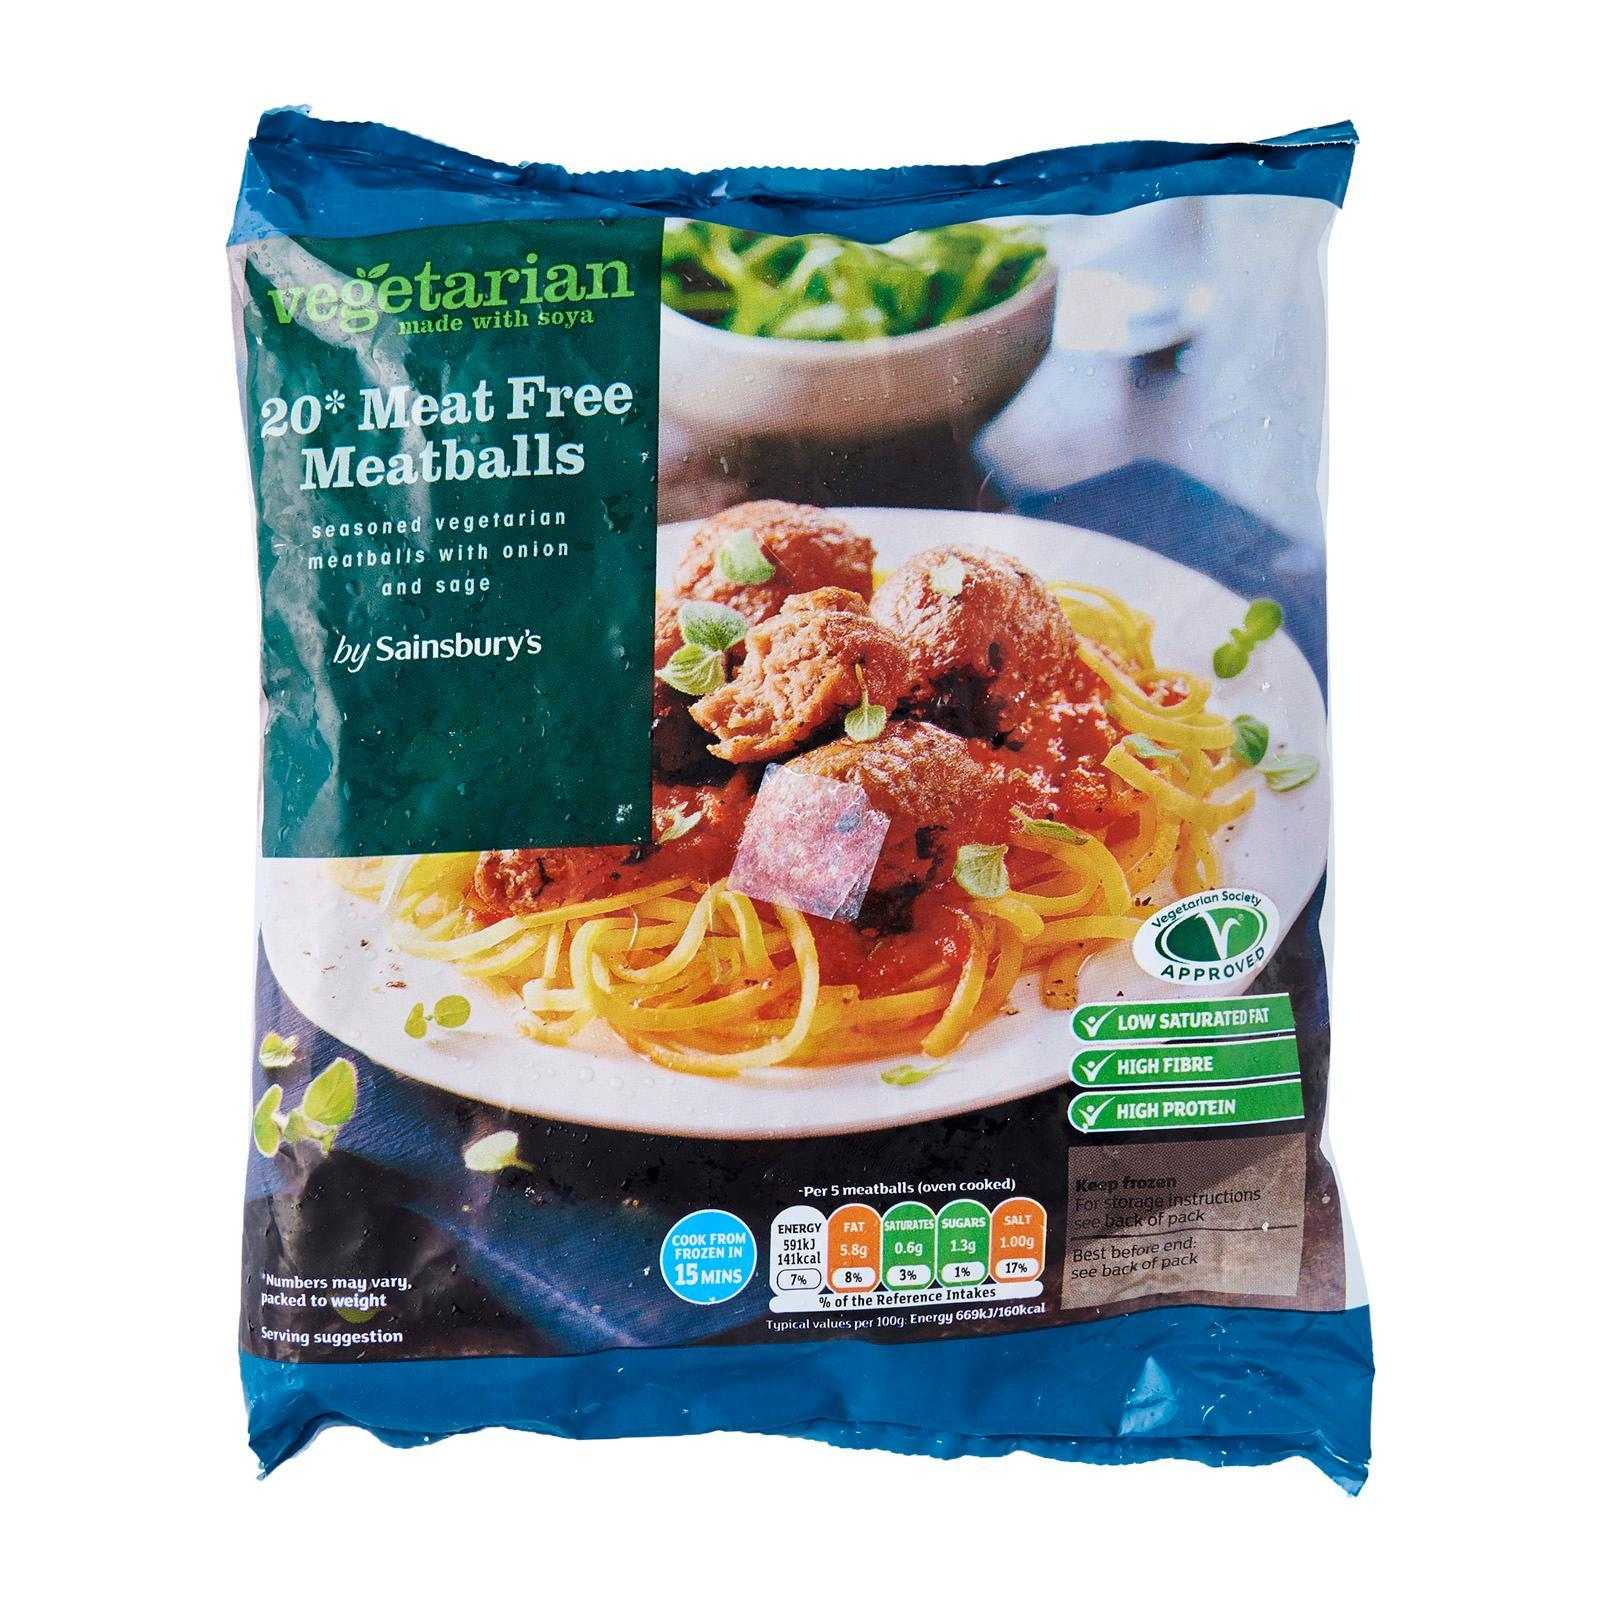 Sainsbury's Meat Free Meatballs - Frozen